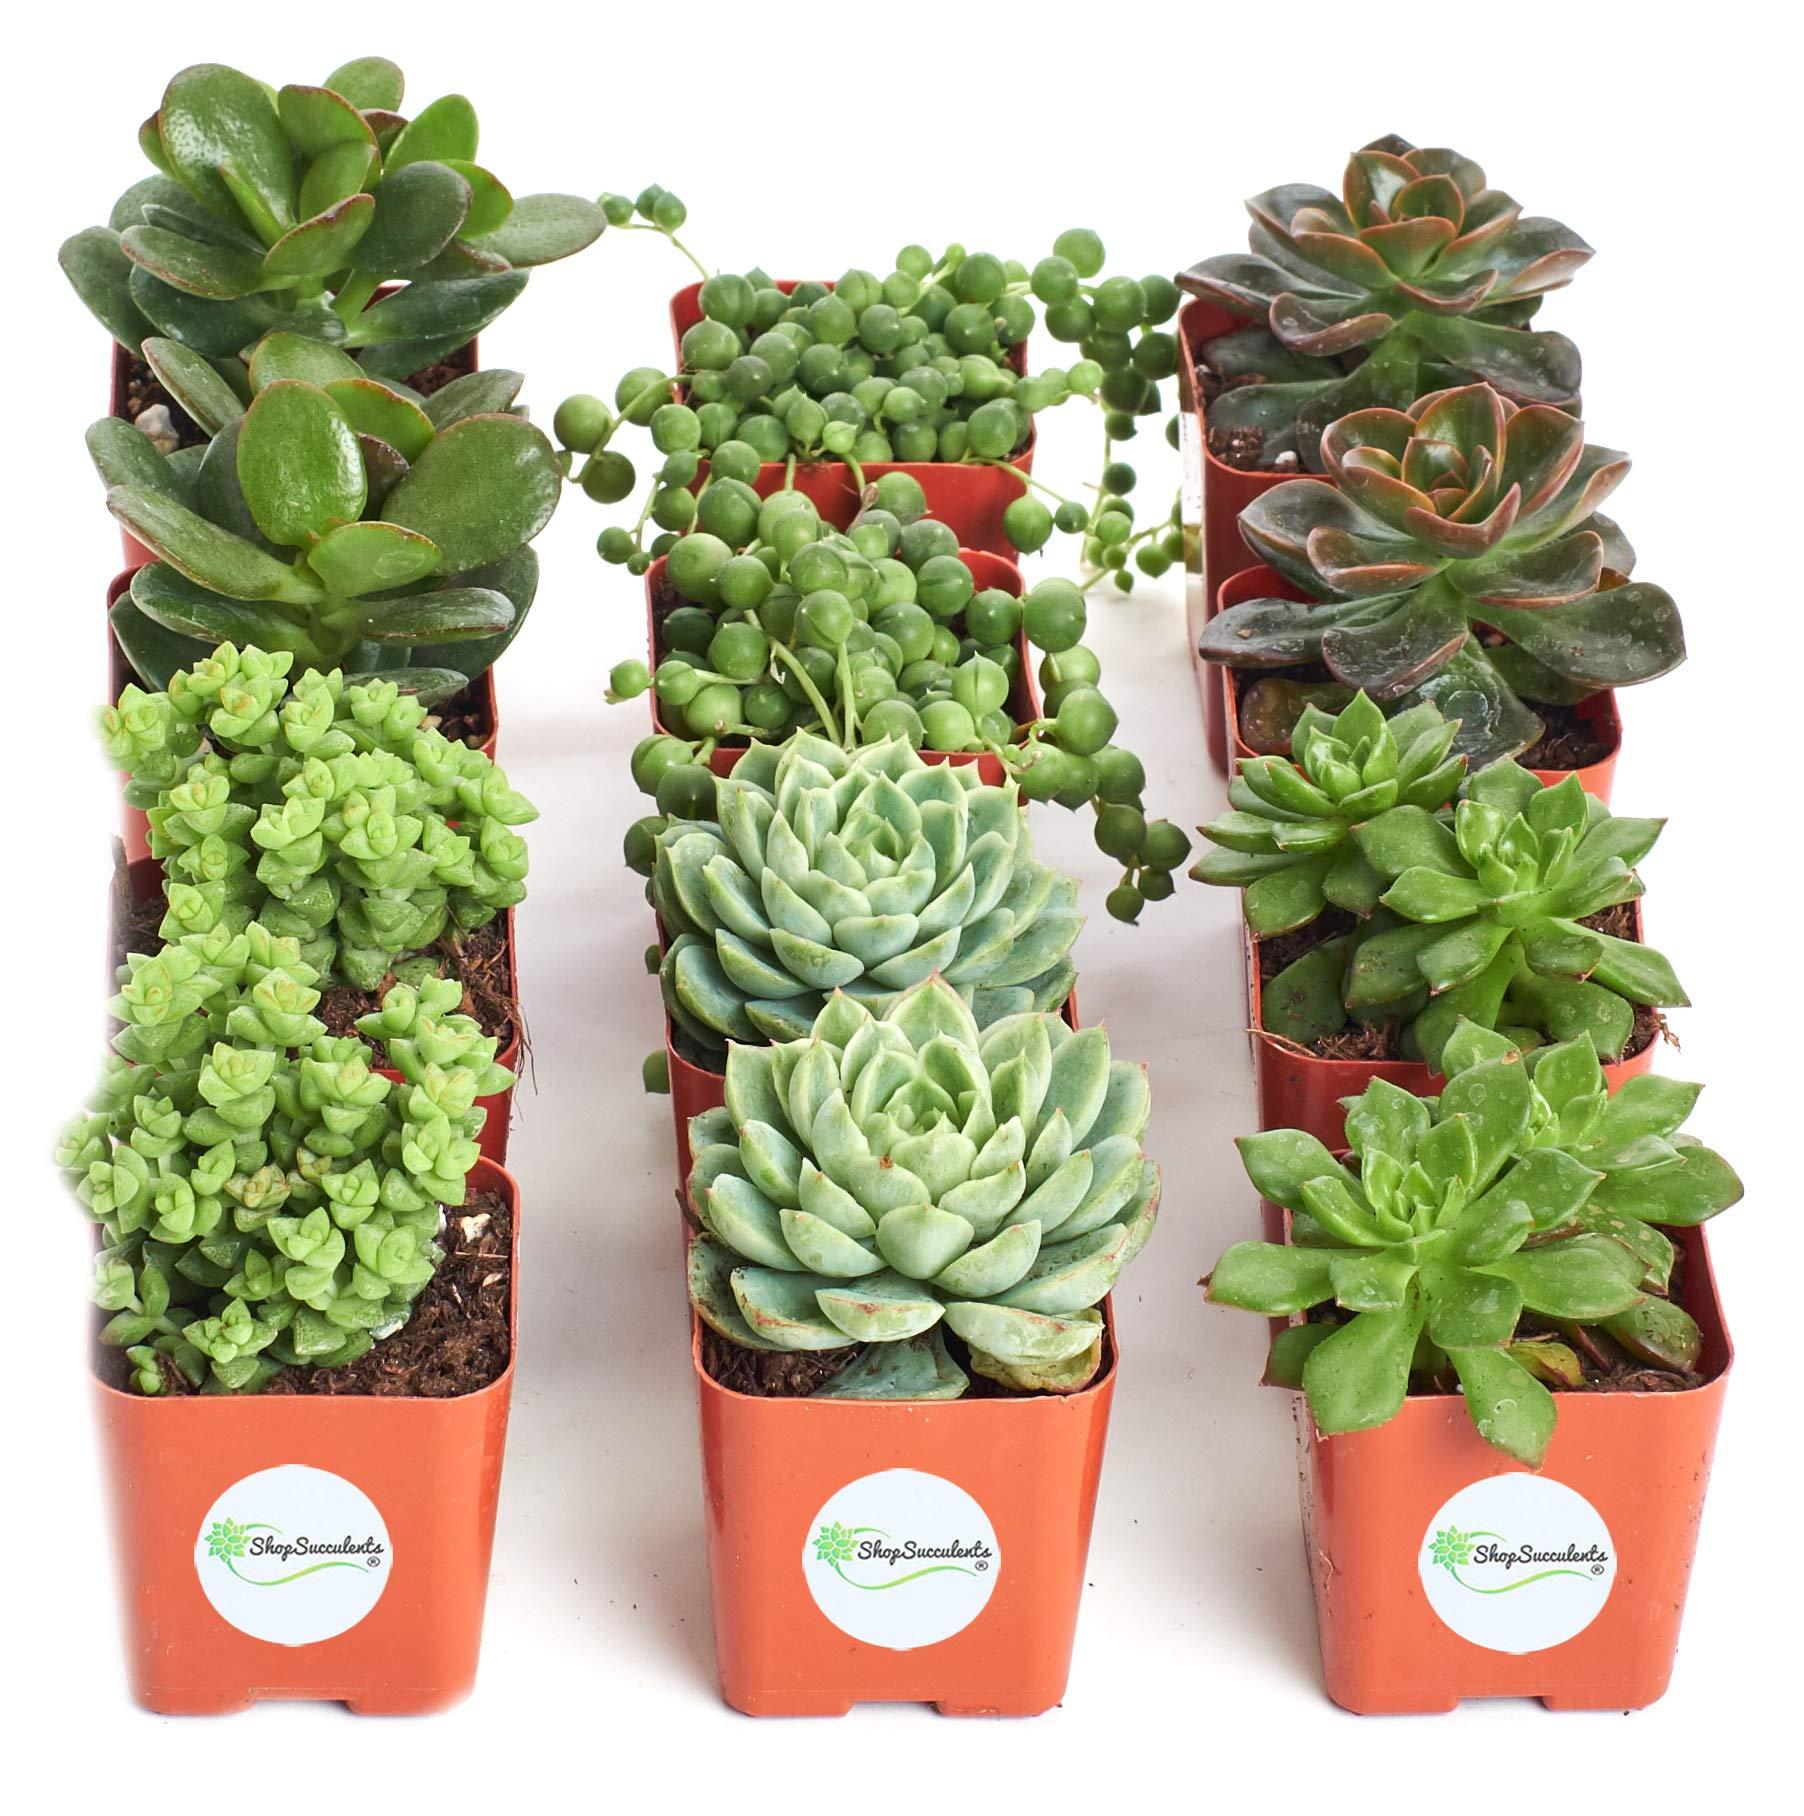 Shop Succulents Green Succulent (Collection of 12)